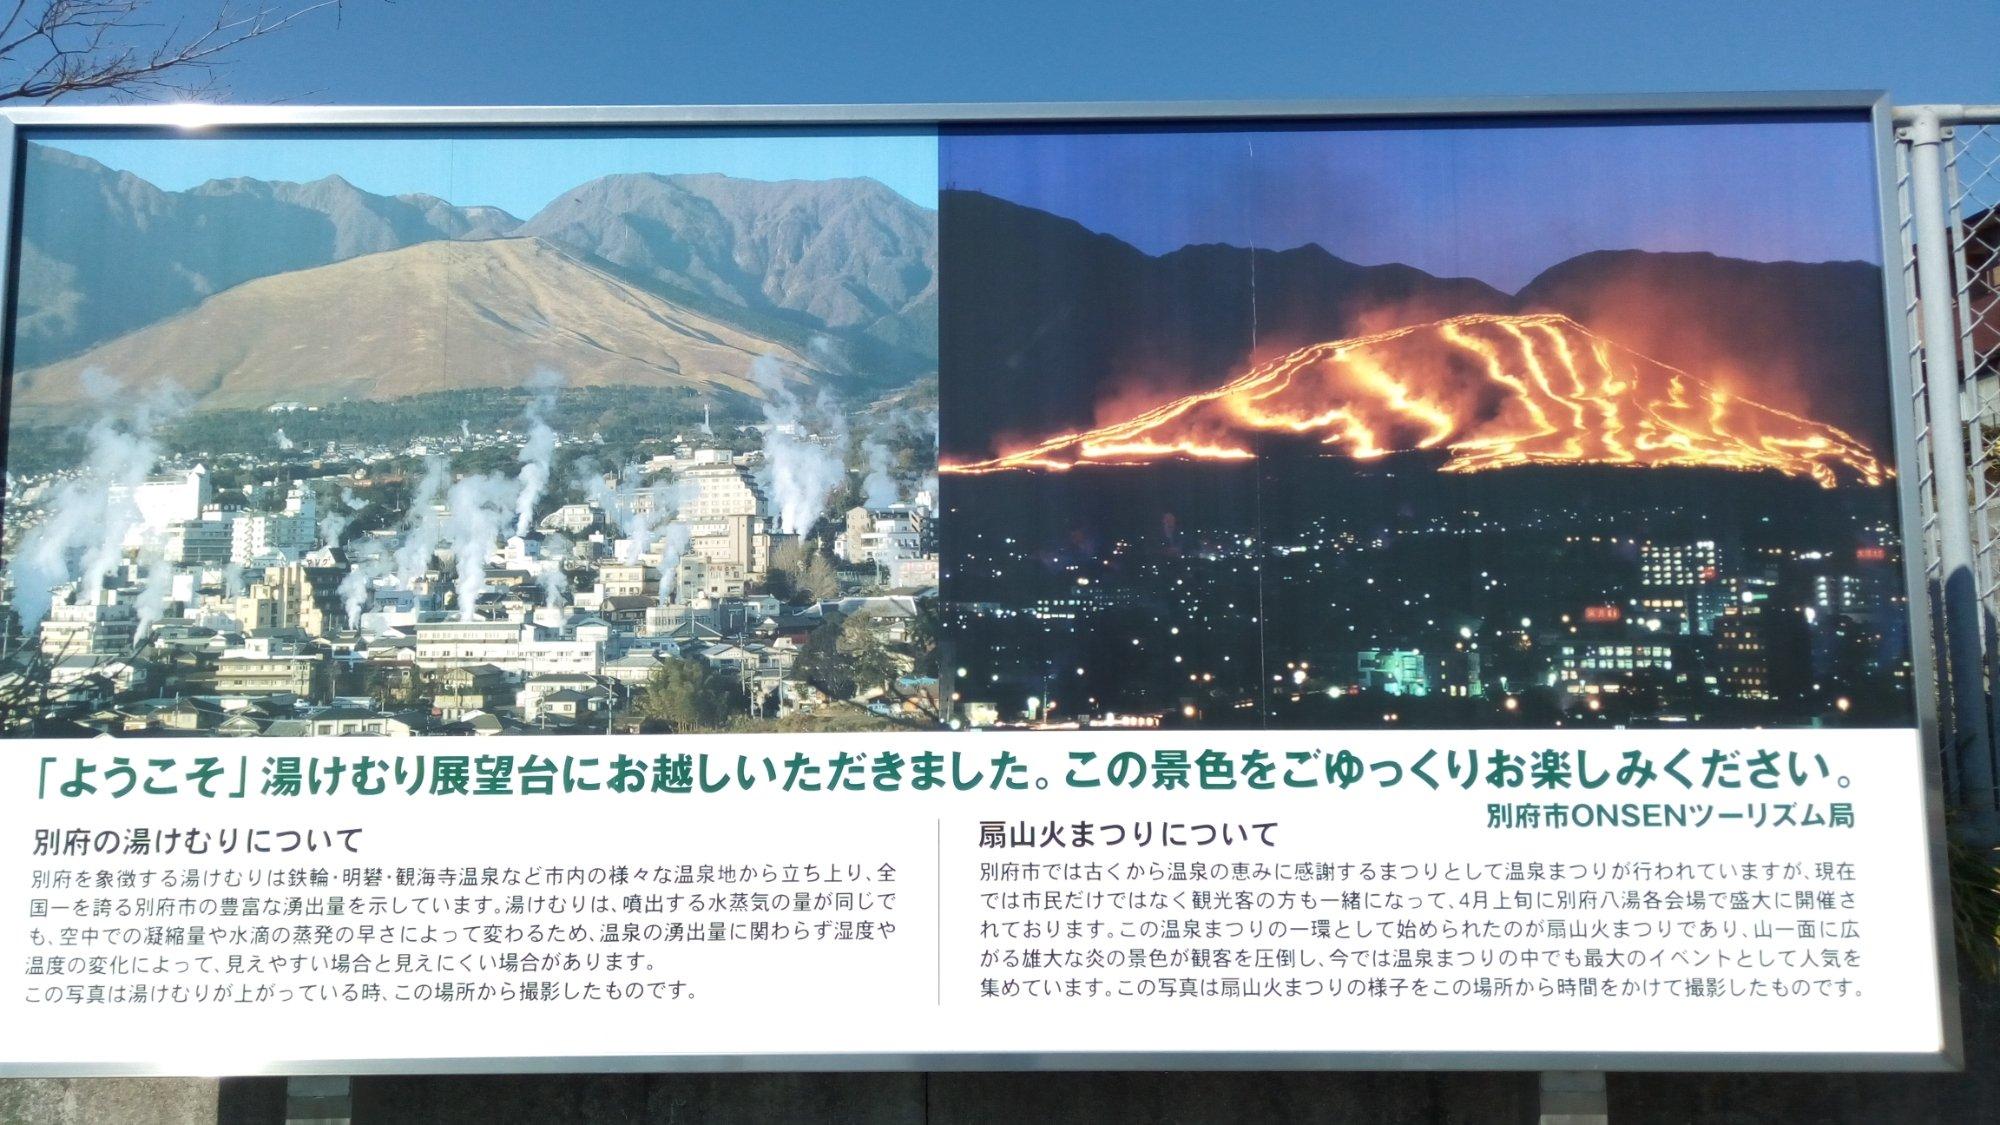 Yukemuri Observatory (Beppu, Japan) - omdömen